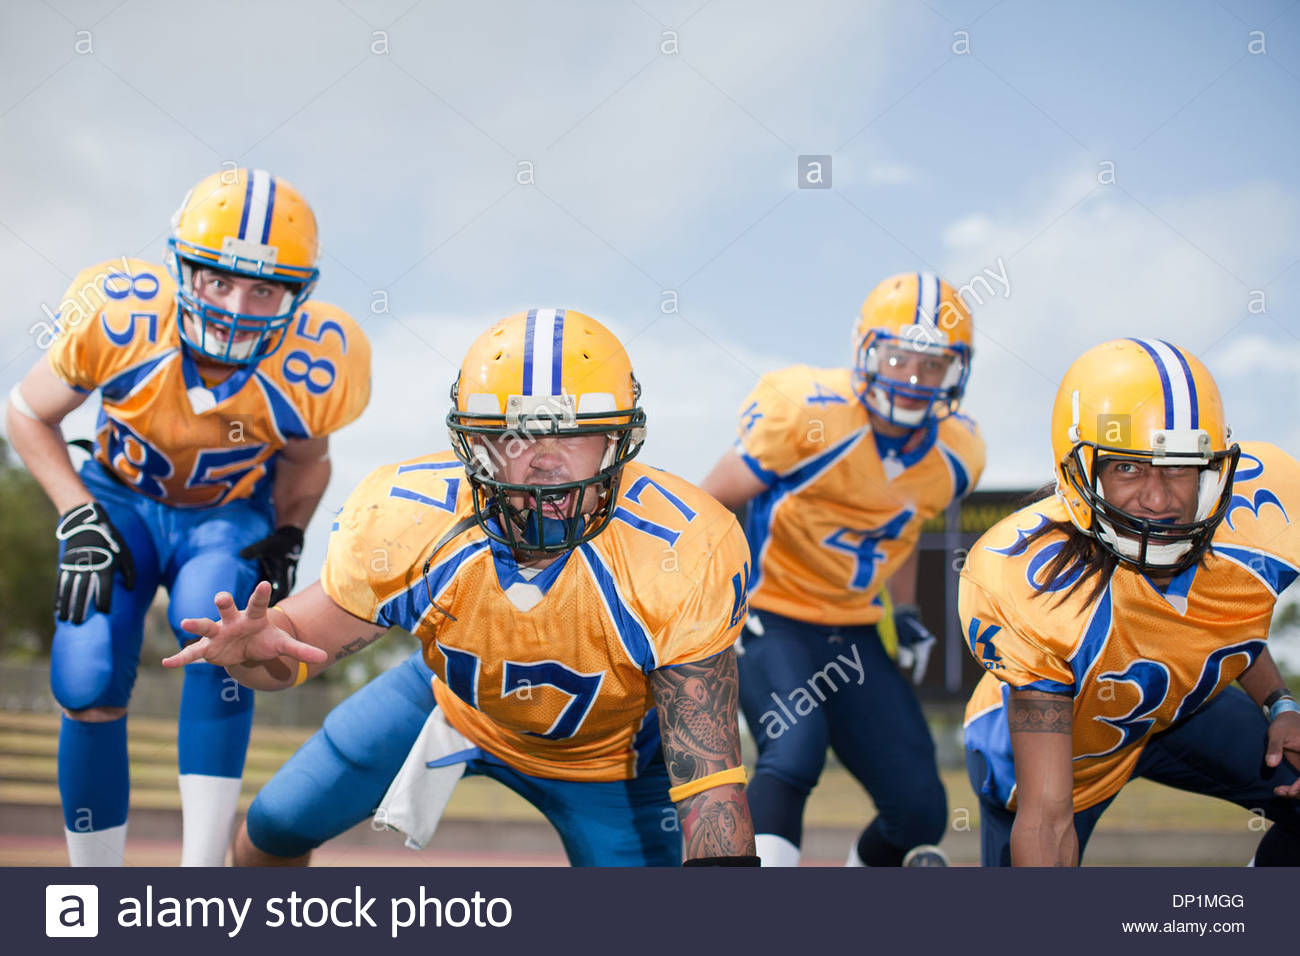 Intimidating football players - Stock Image